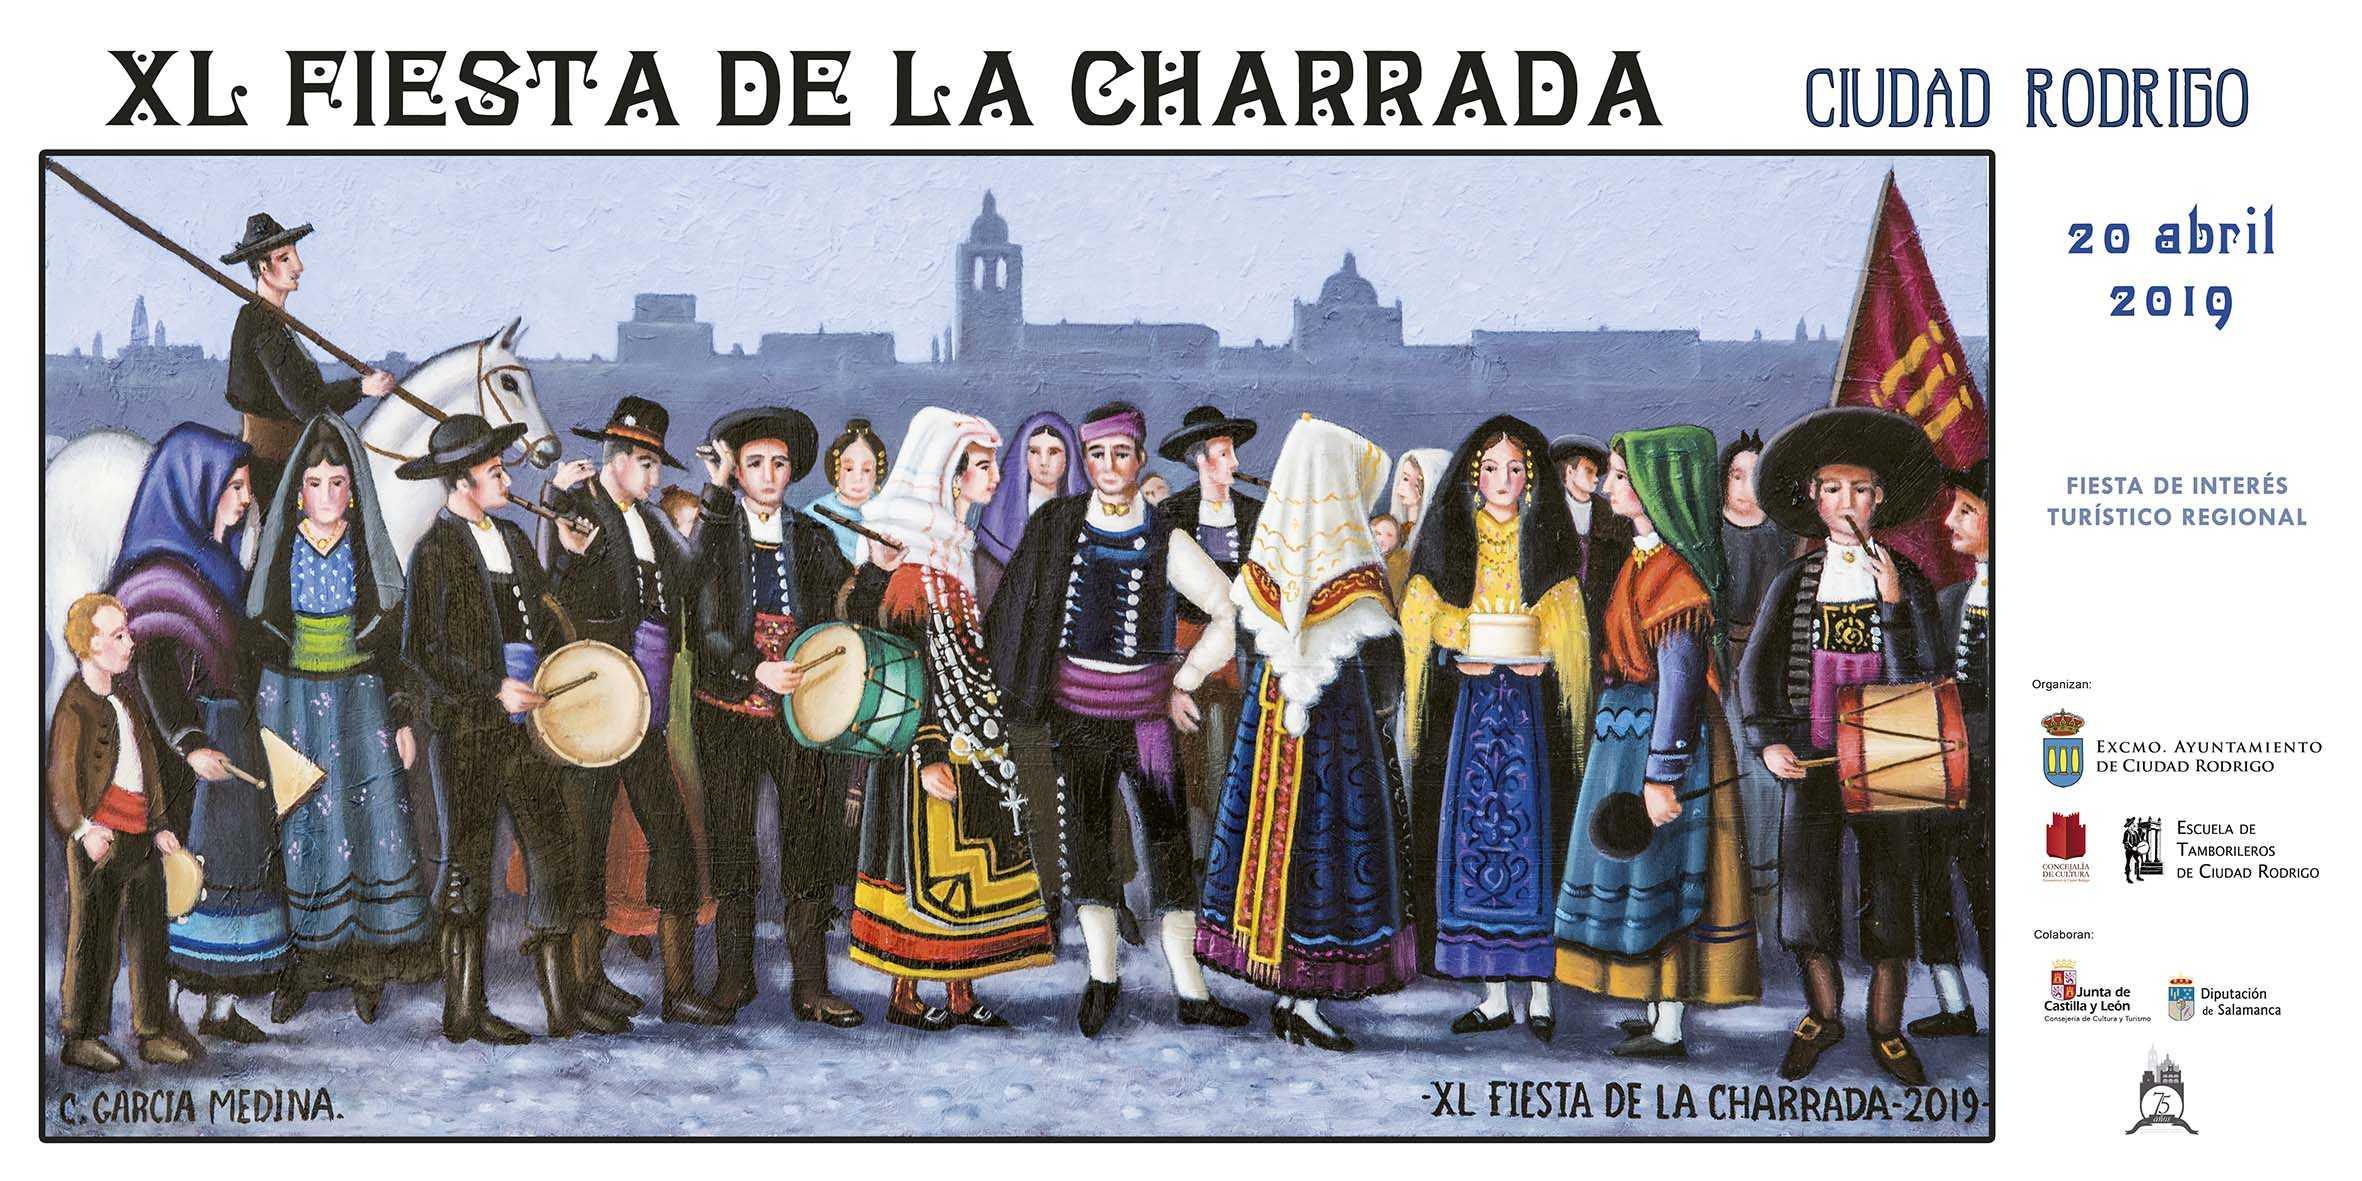 fiesta-de-la-charrada-2019-cartel